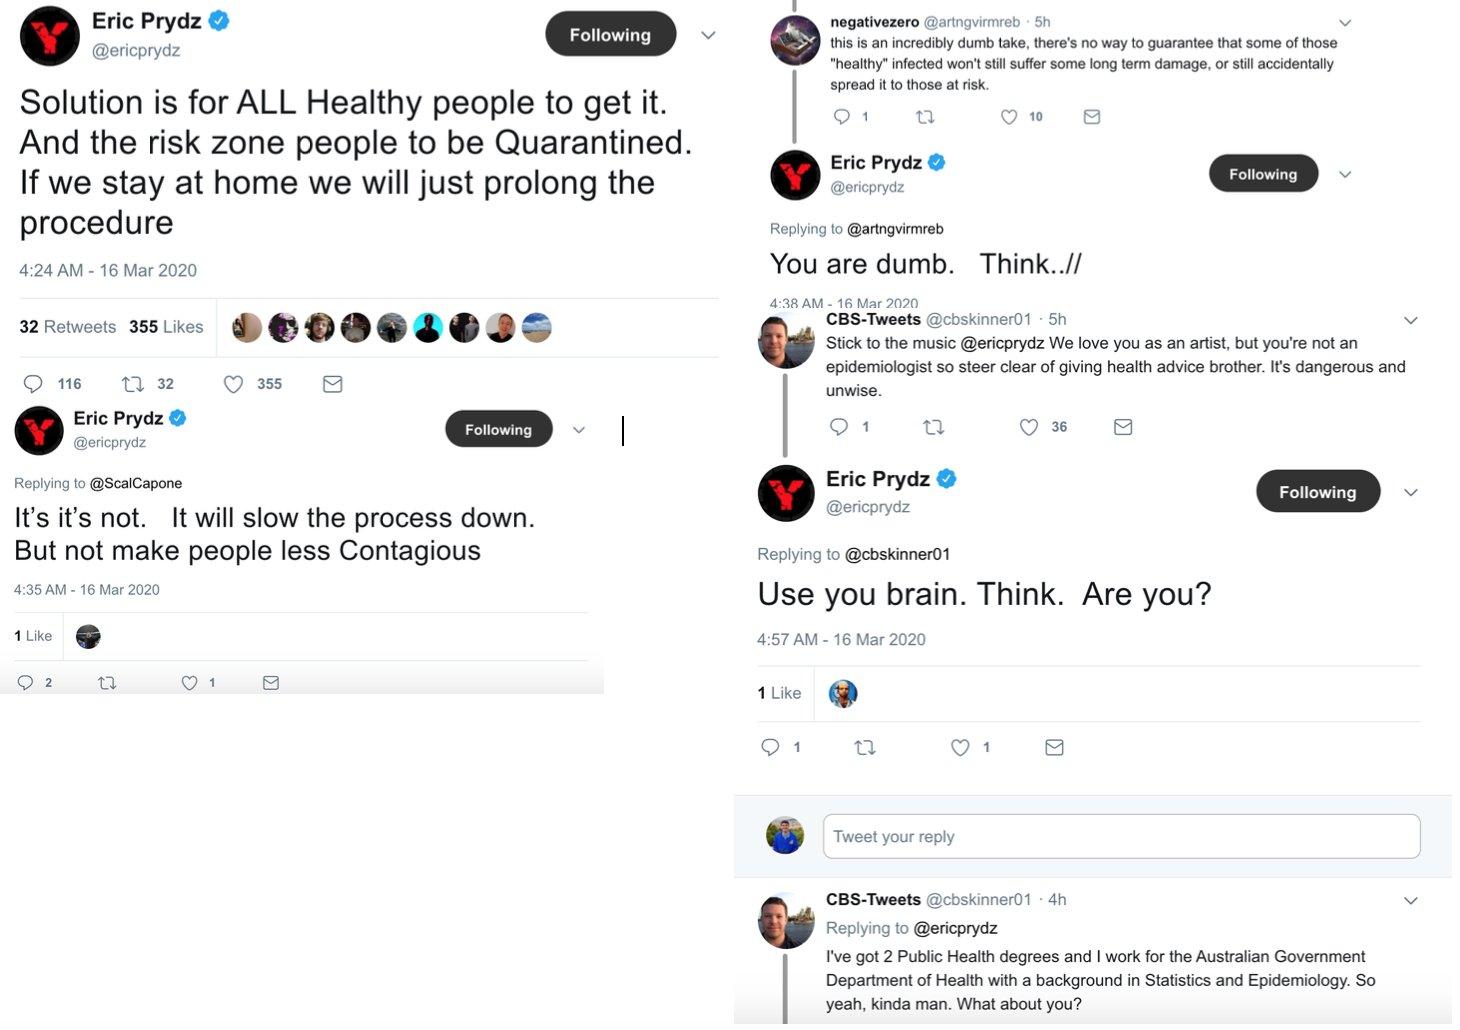 Eric Prydz Faces Backlash for Coronavirus Comments